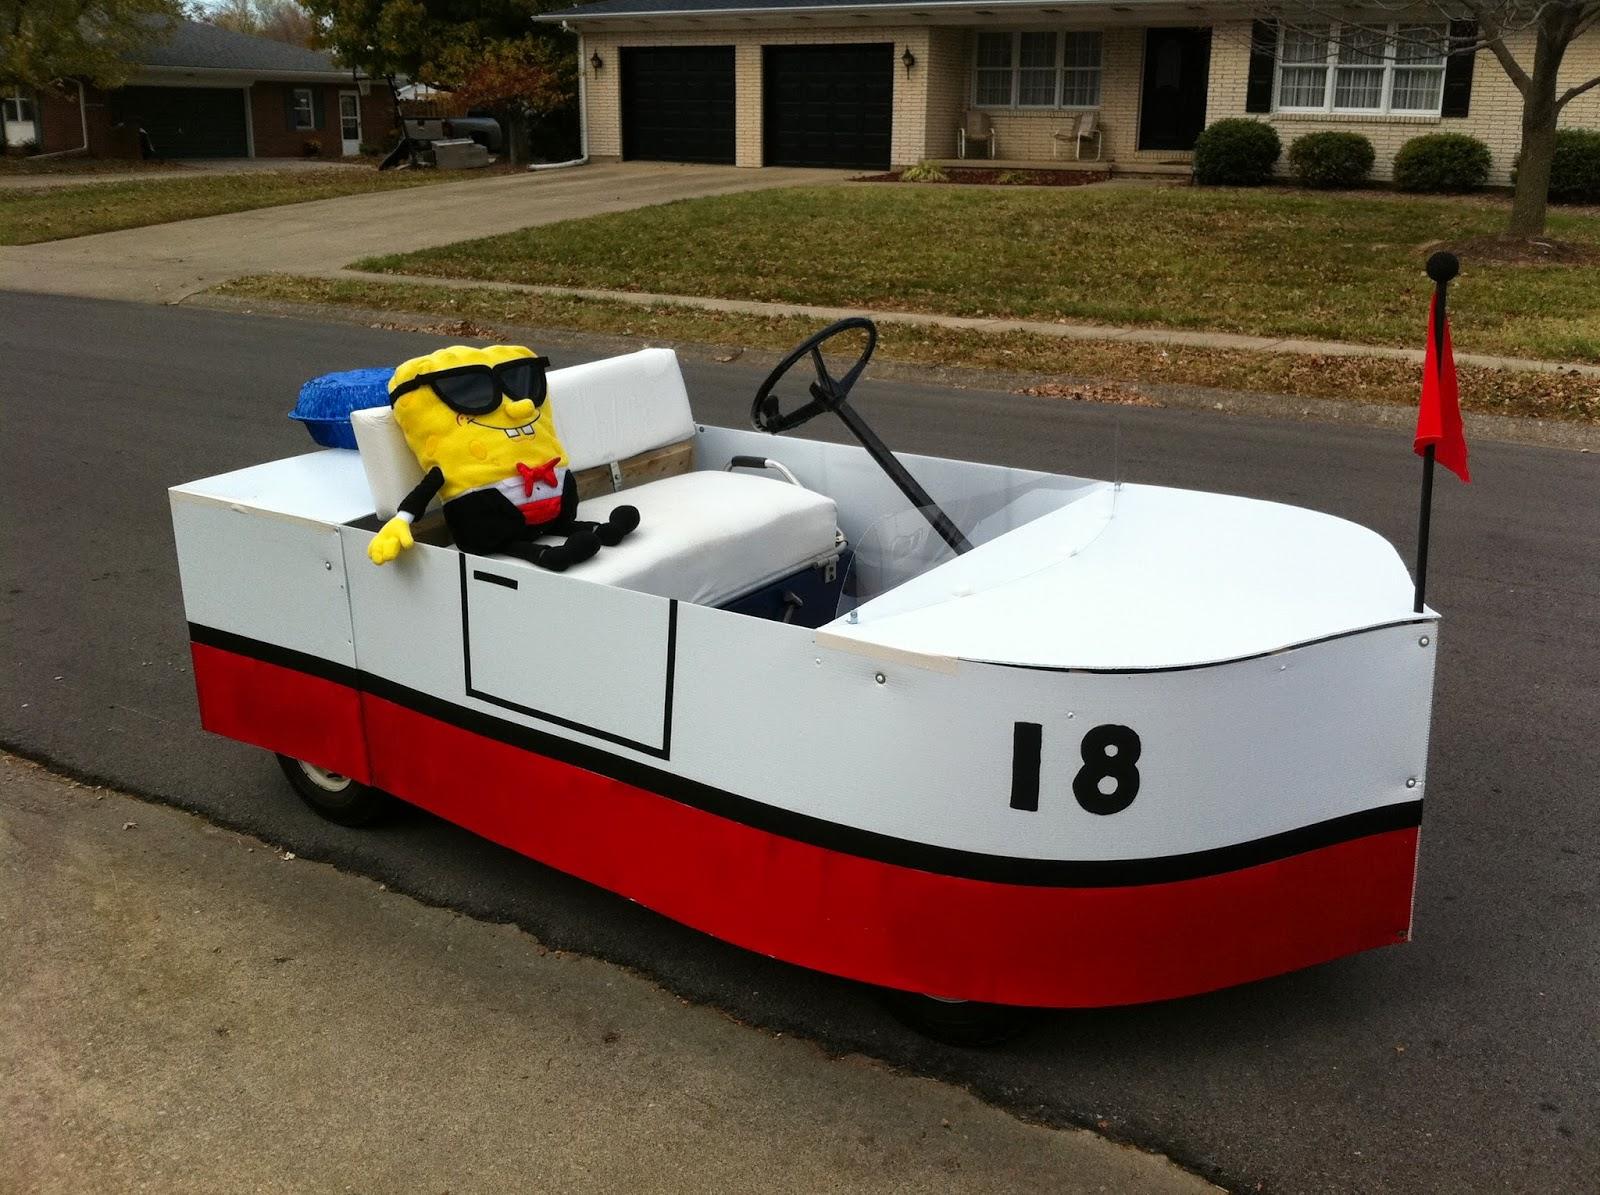 Boat Car Spongebob